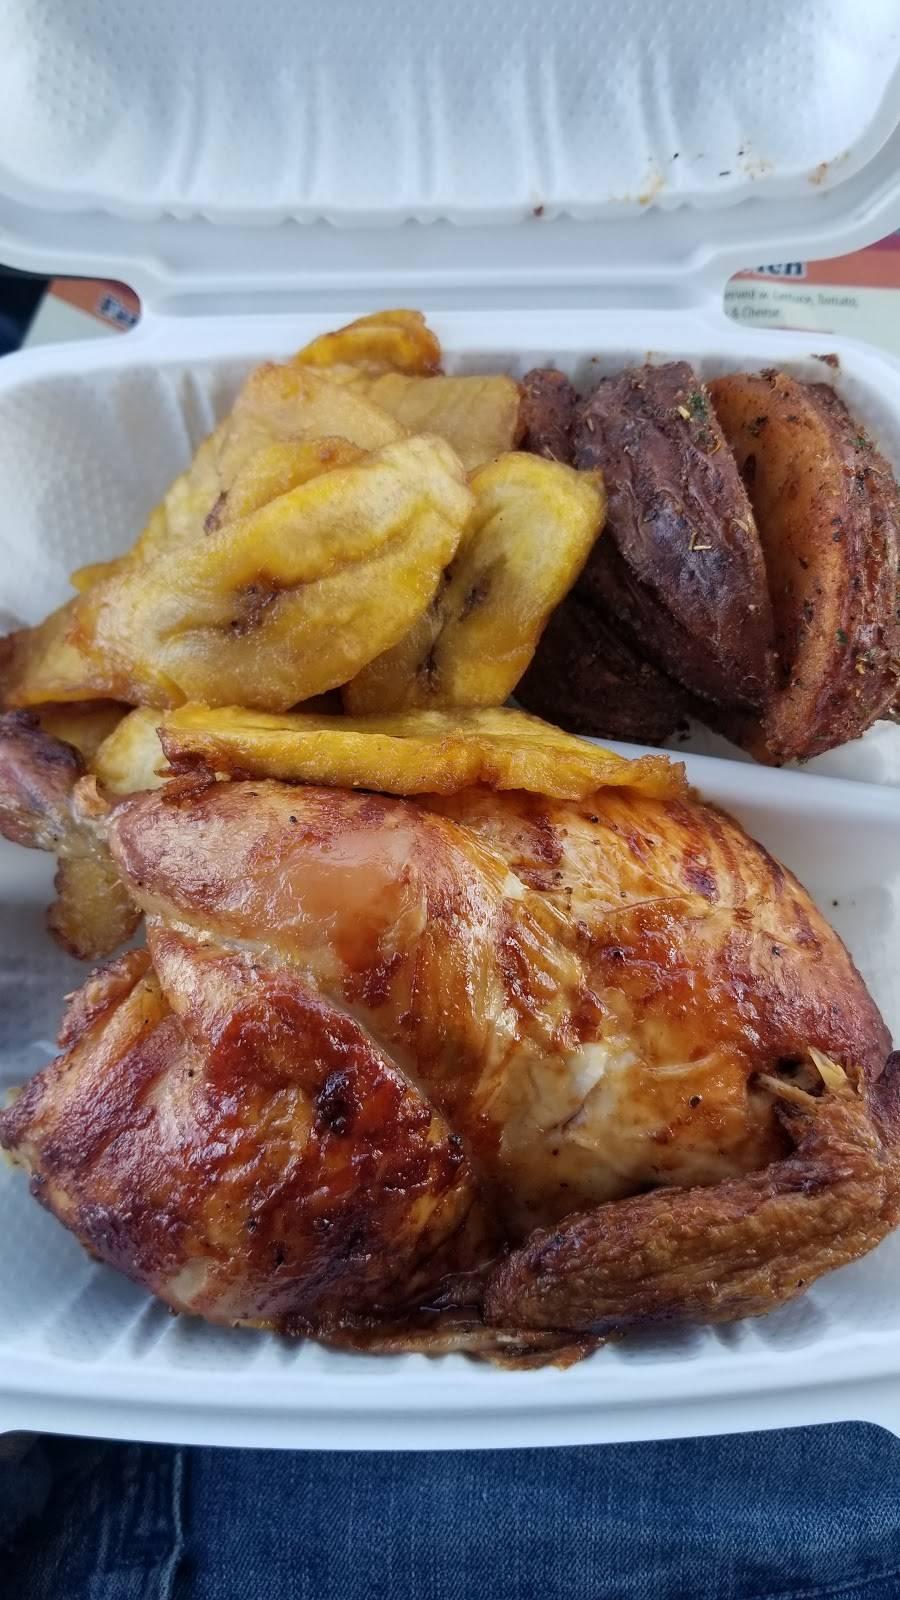 Courtneys Rotisserie & Grill | restaurant | 2175 Ralph Ave, Brooklyn, NY 11234, USA | 7189681888 OR +1 718-968-1888